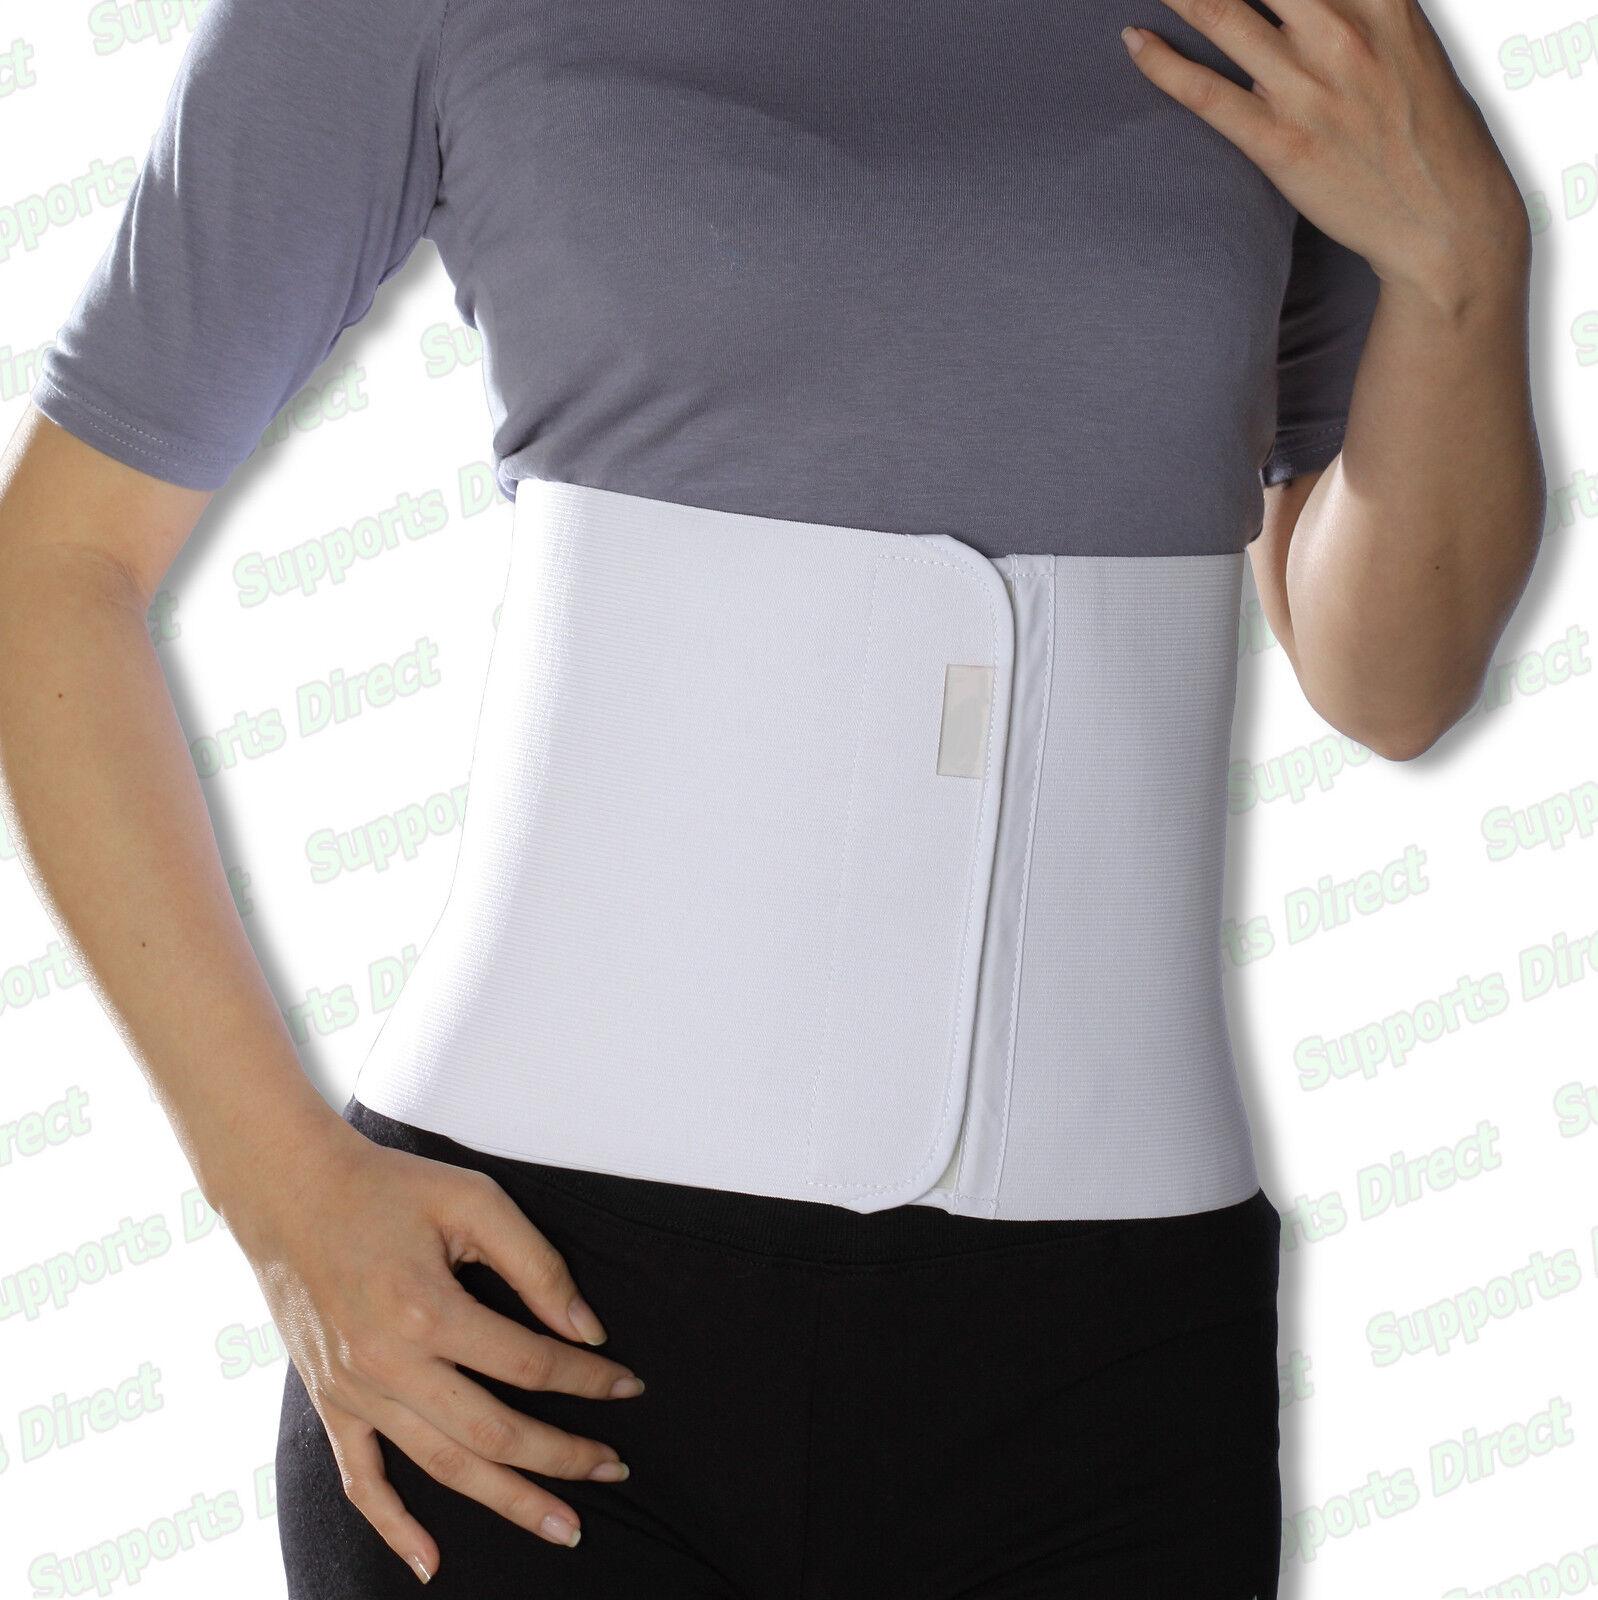 Elastic Abdominal Binder Stomach Compression Slimming Belt